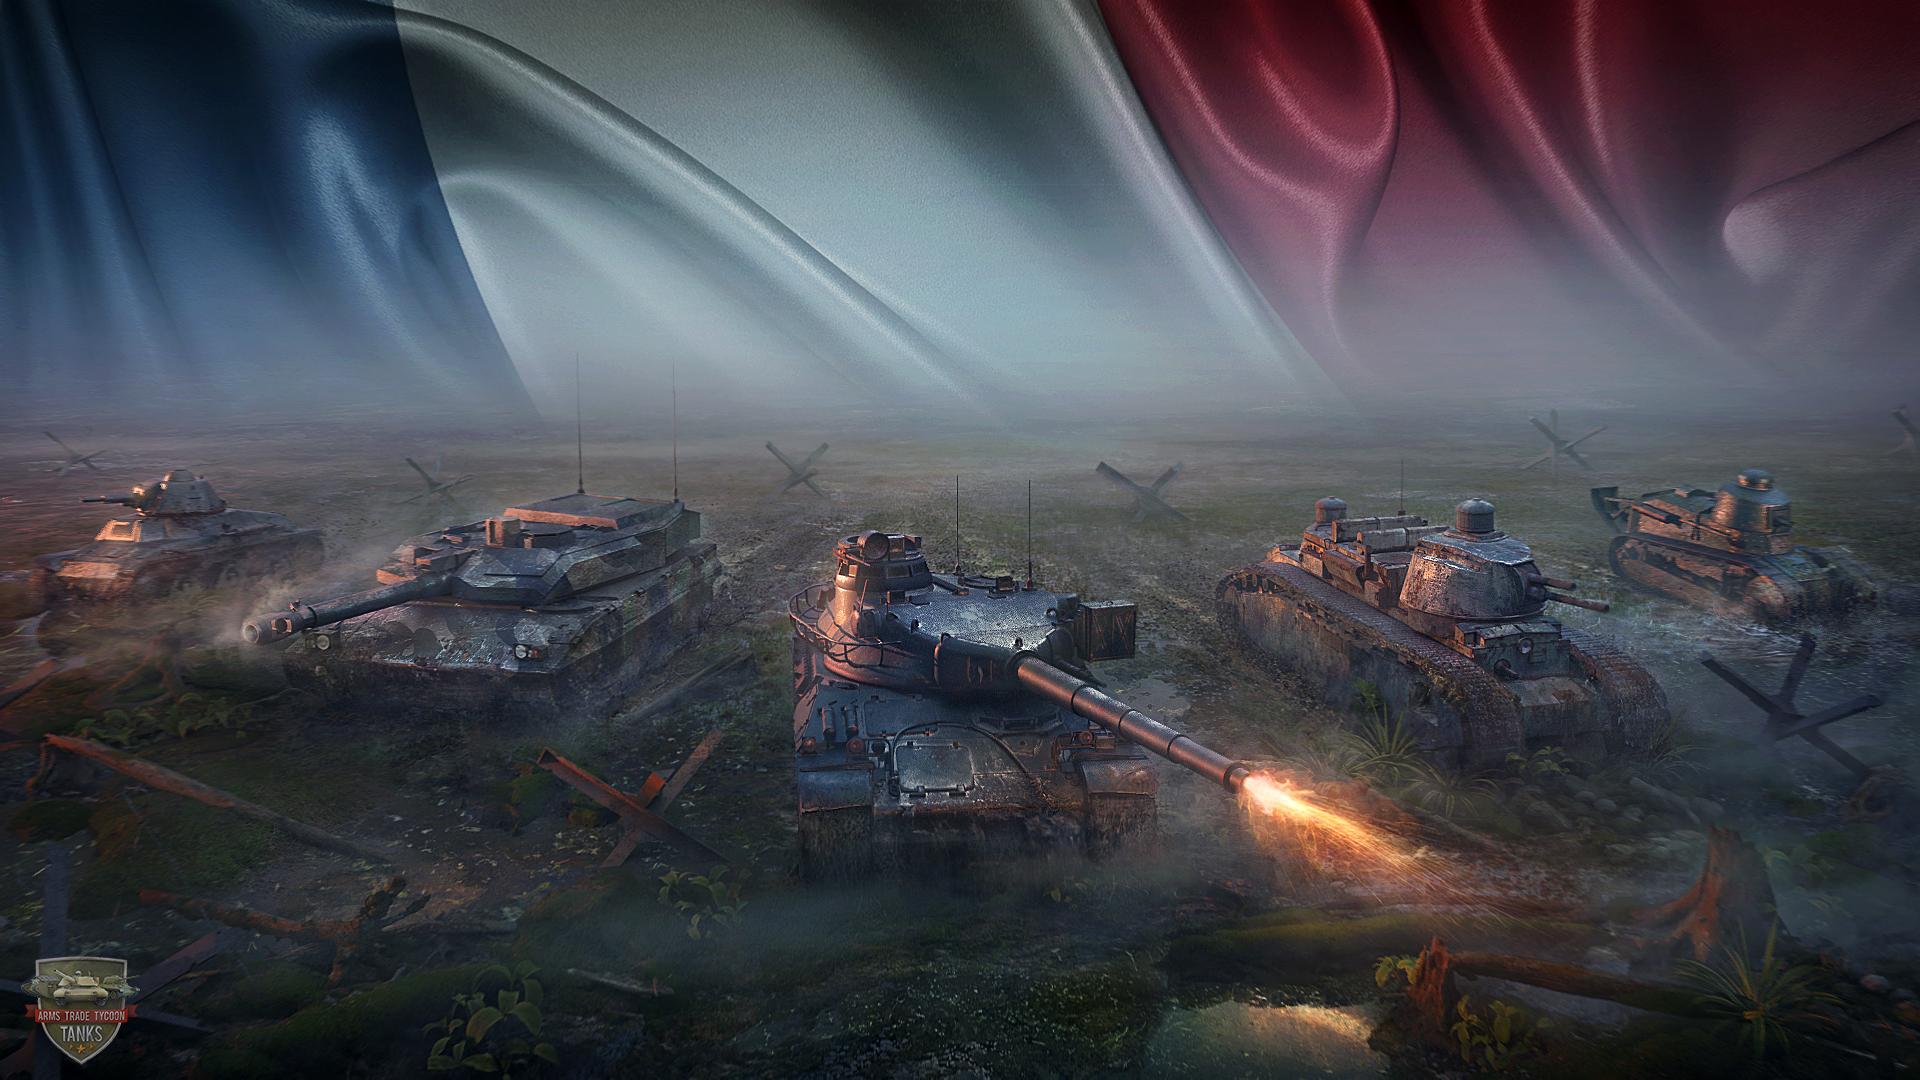 France tank school